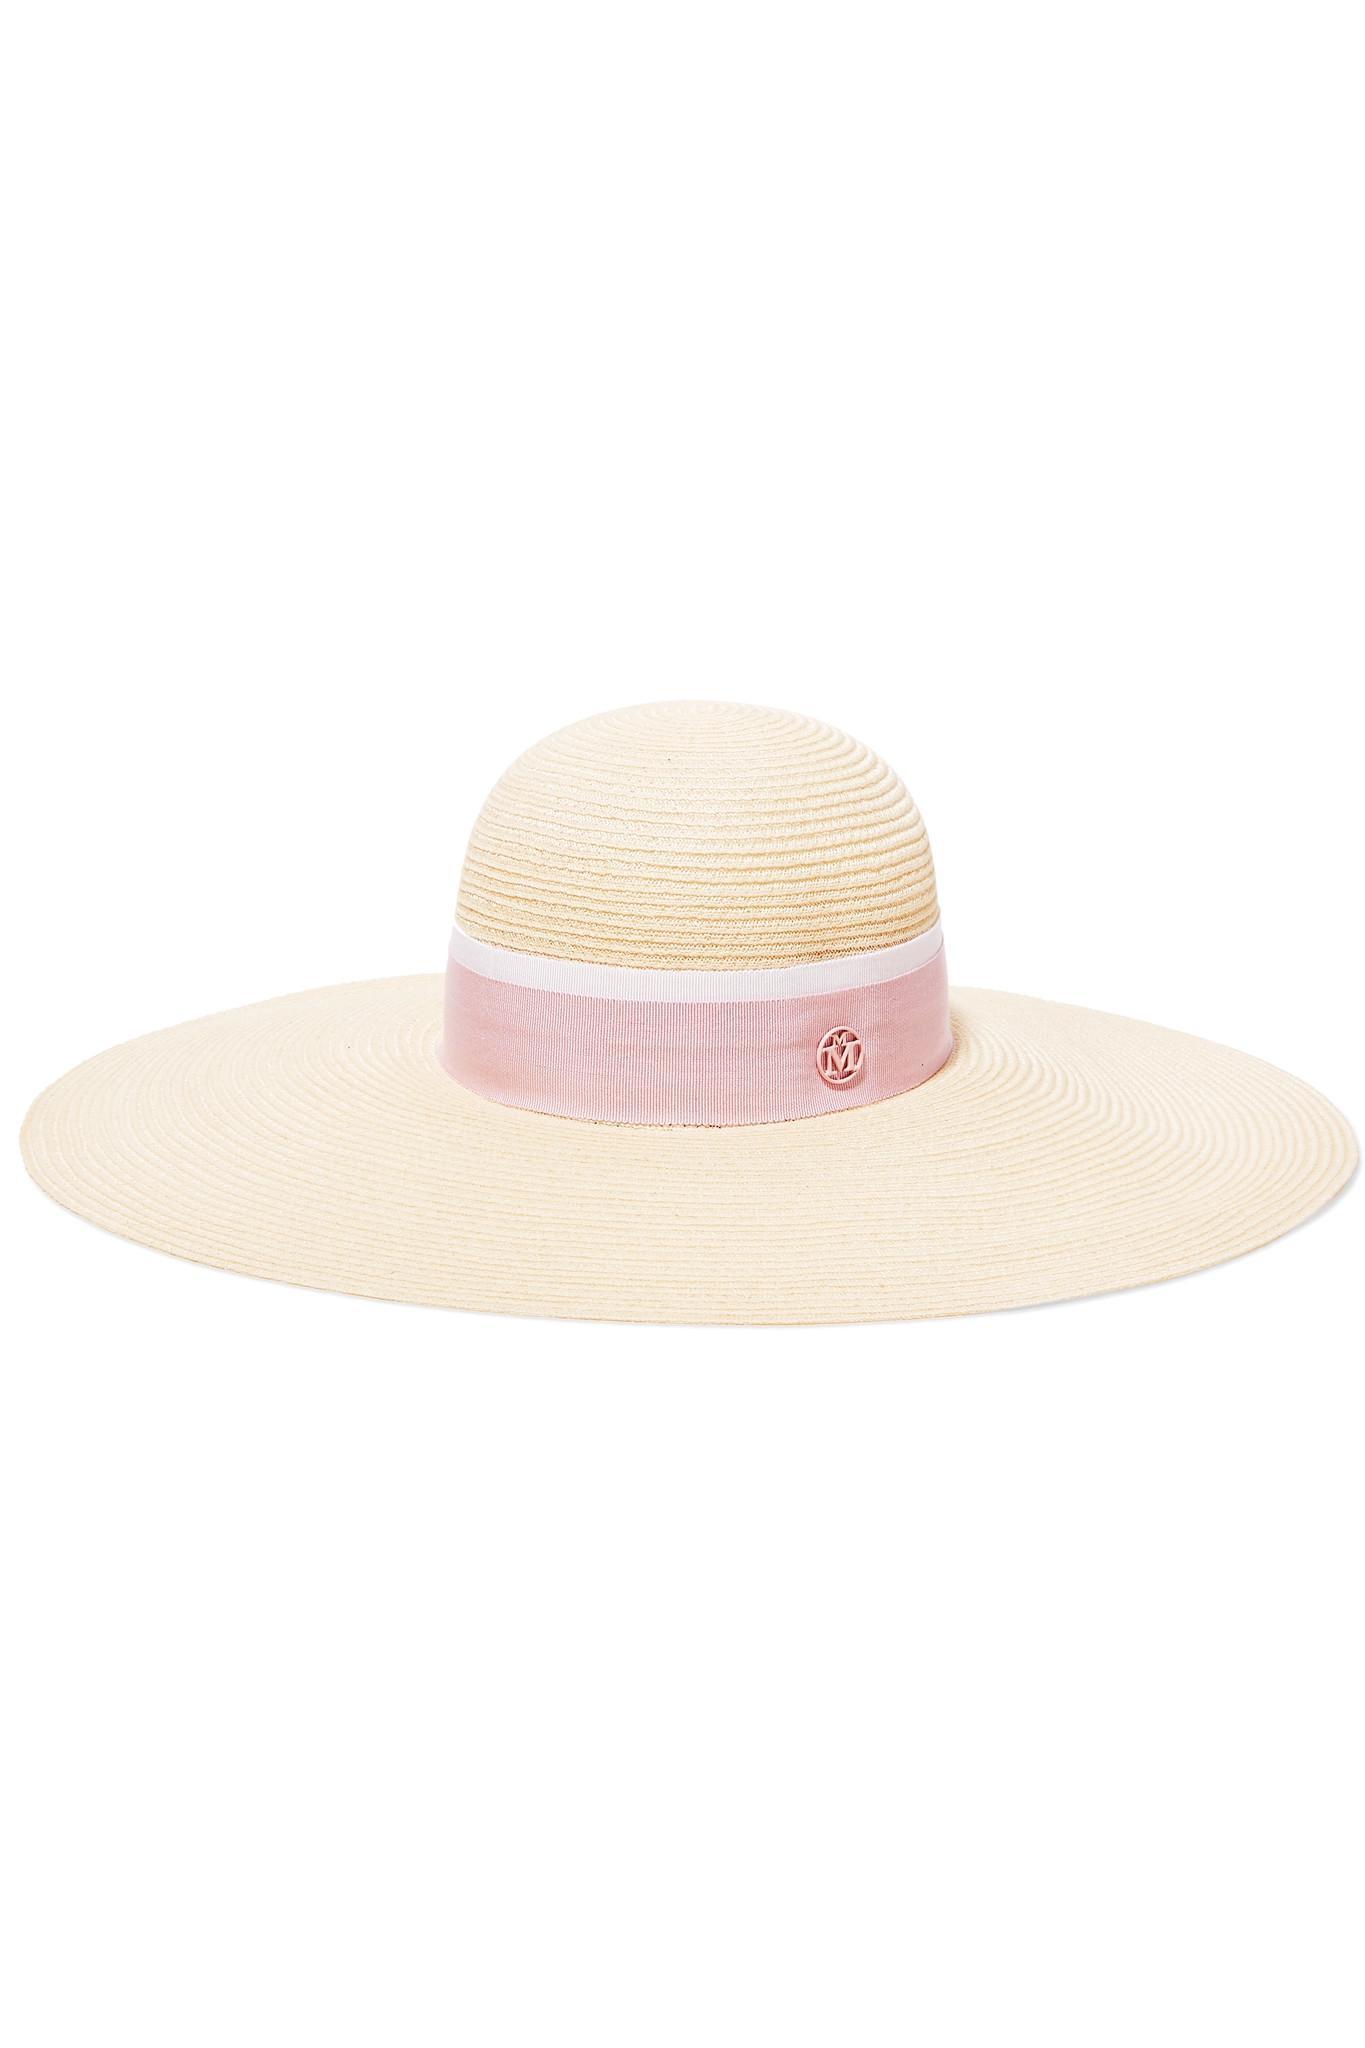 Blanche Polka-dot Silk Faille-trimmed Hemp Sunhat - Ivory Maison Michel OSI09VTEFB